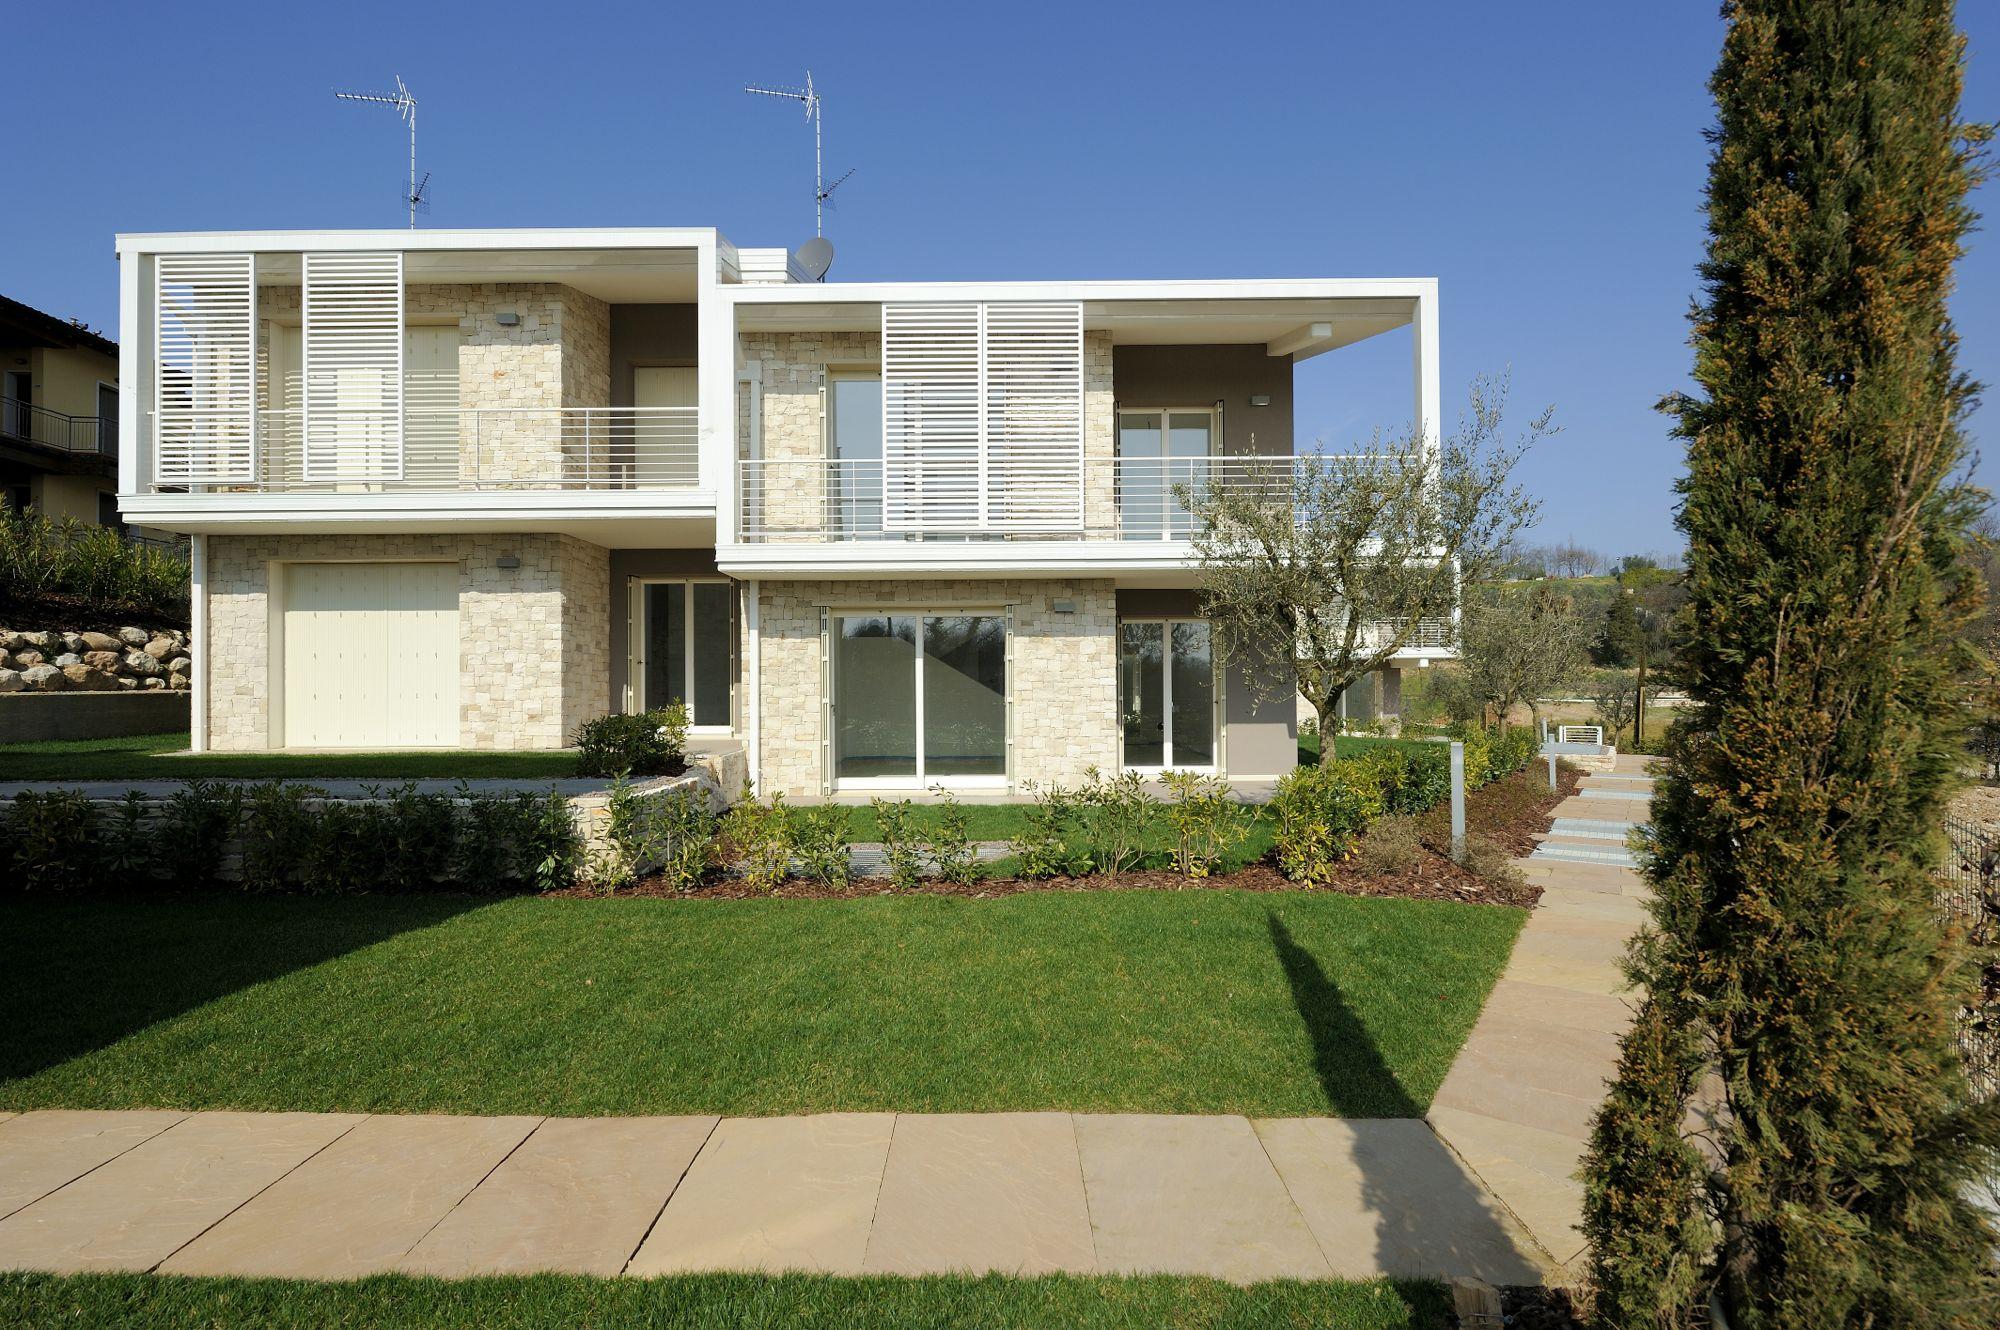 Villa in vendita a costermano verona riscaldamento for Garage autonomo